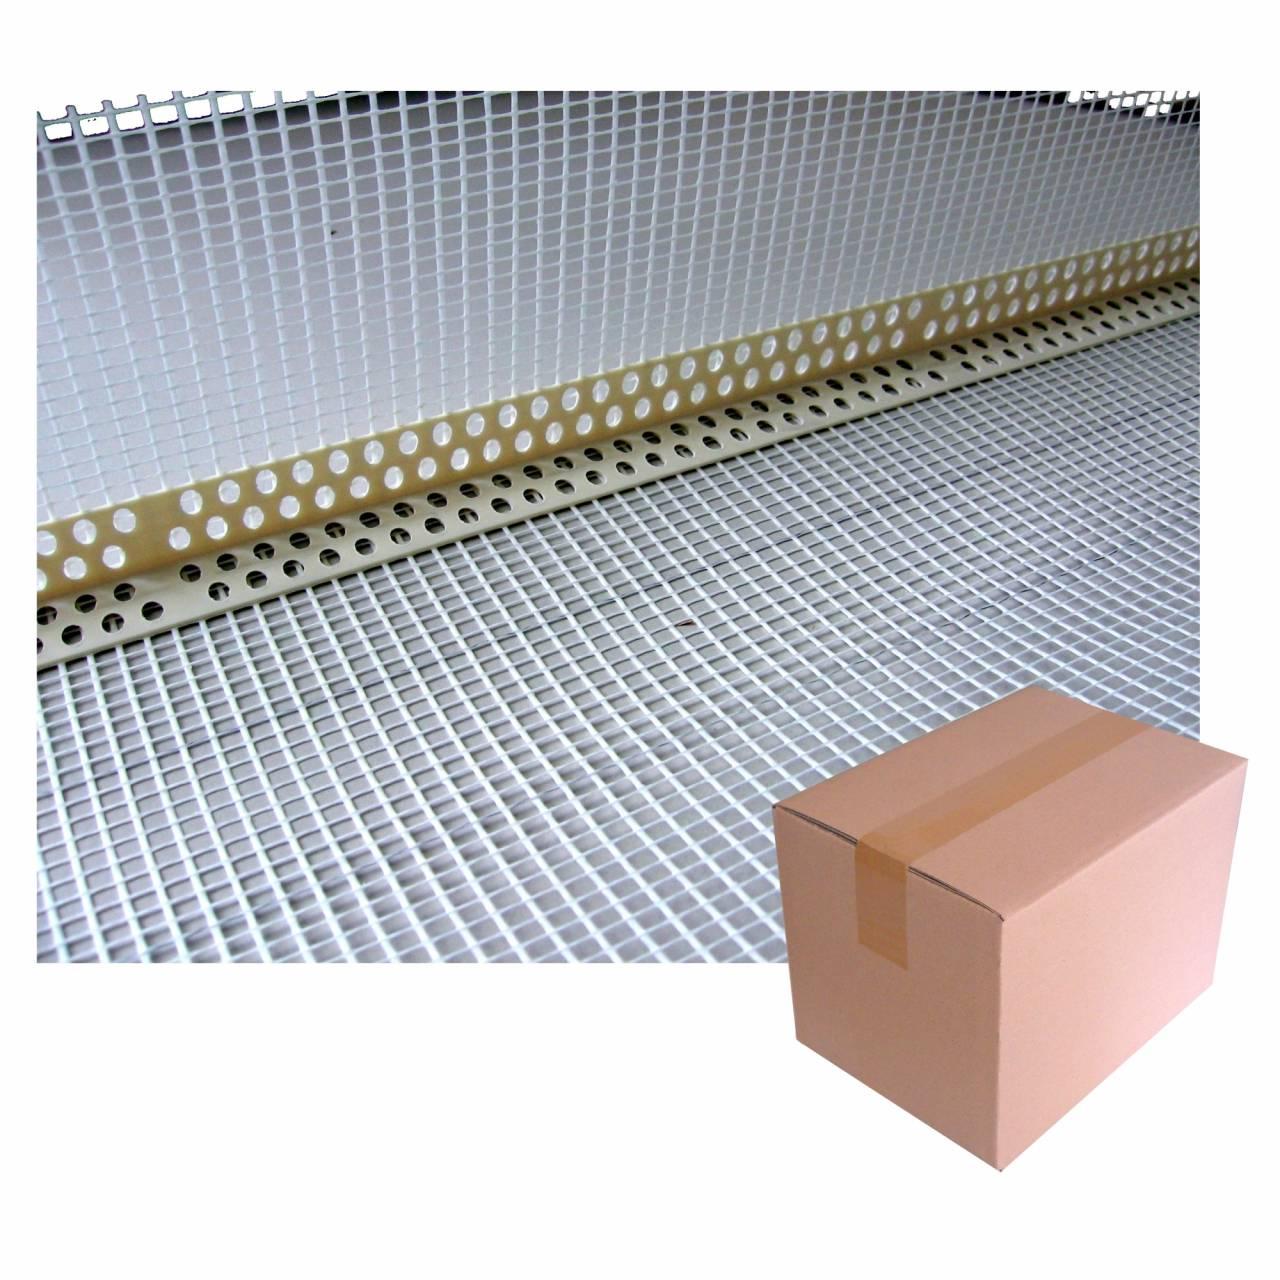 PVC-Eckwinkel 2,5 m, 80x120 Gewebe gelb / Krt a 250 lfm